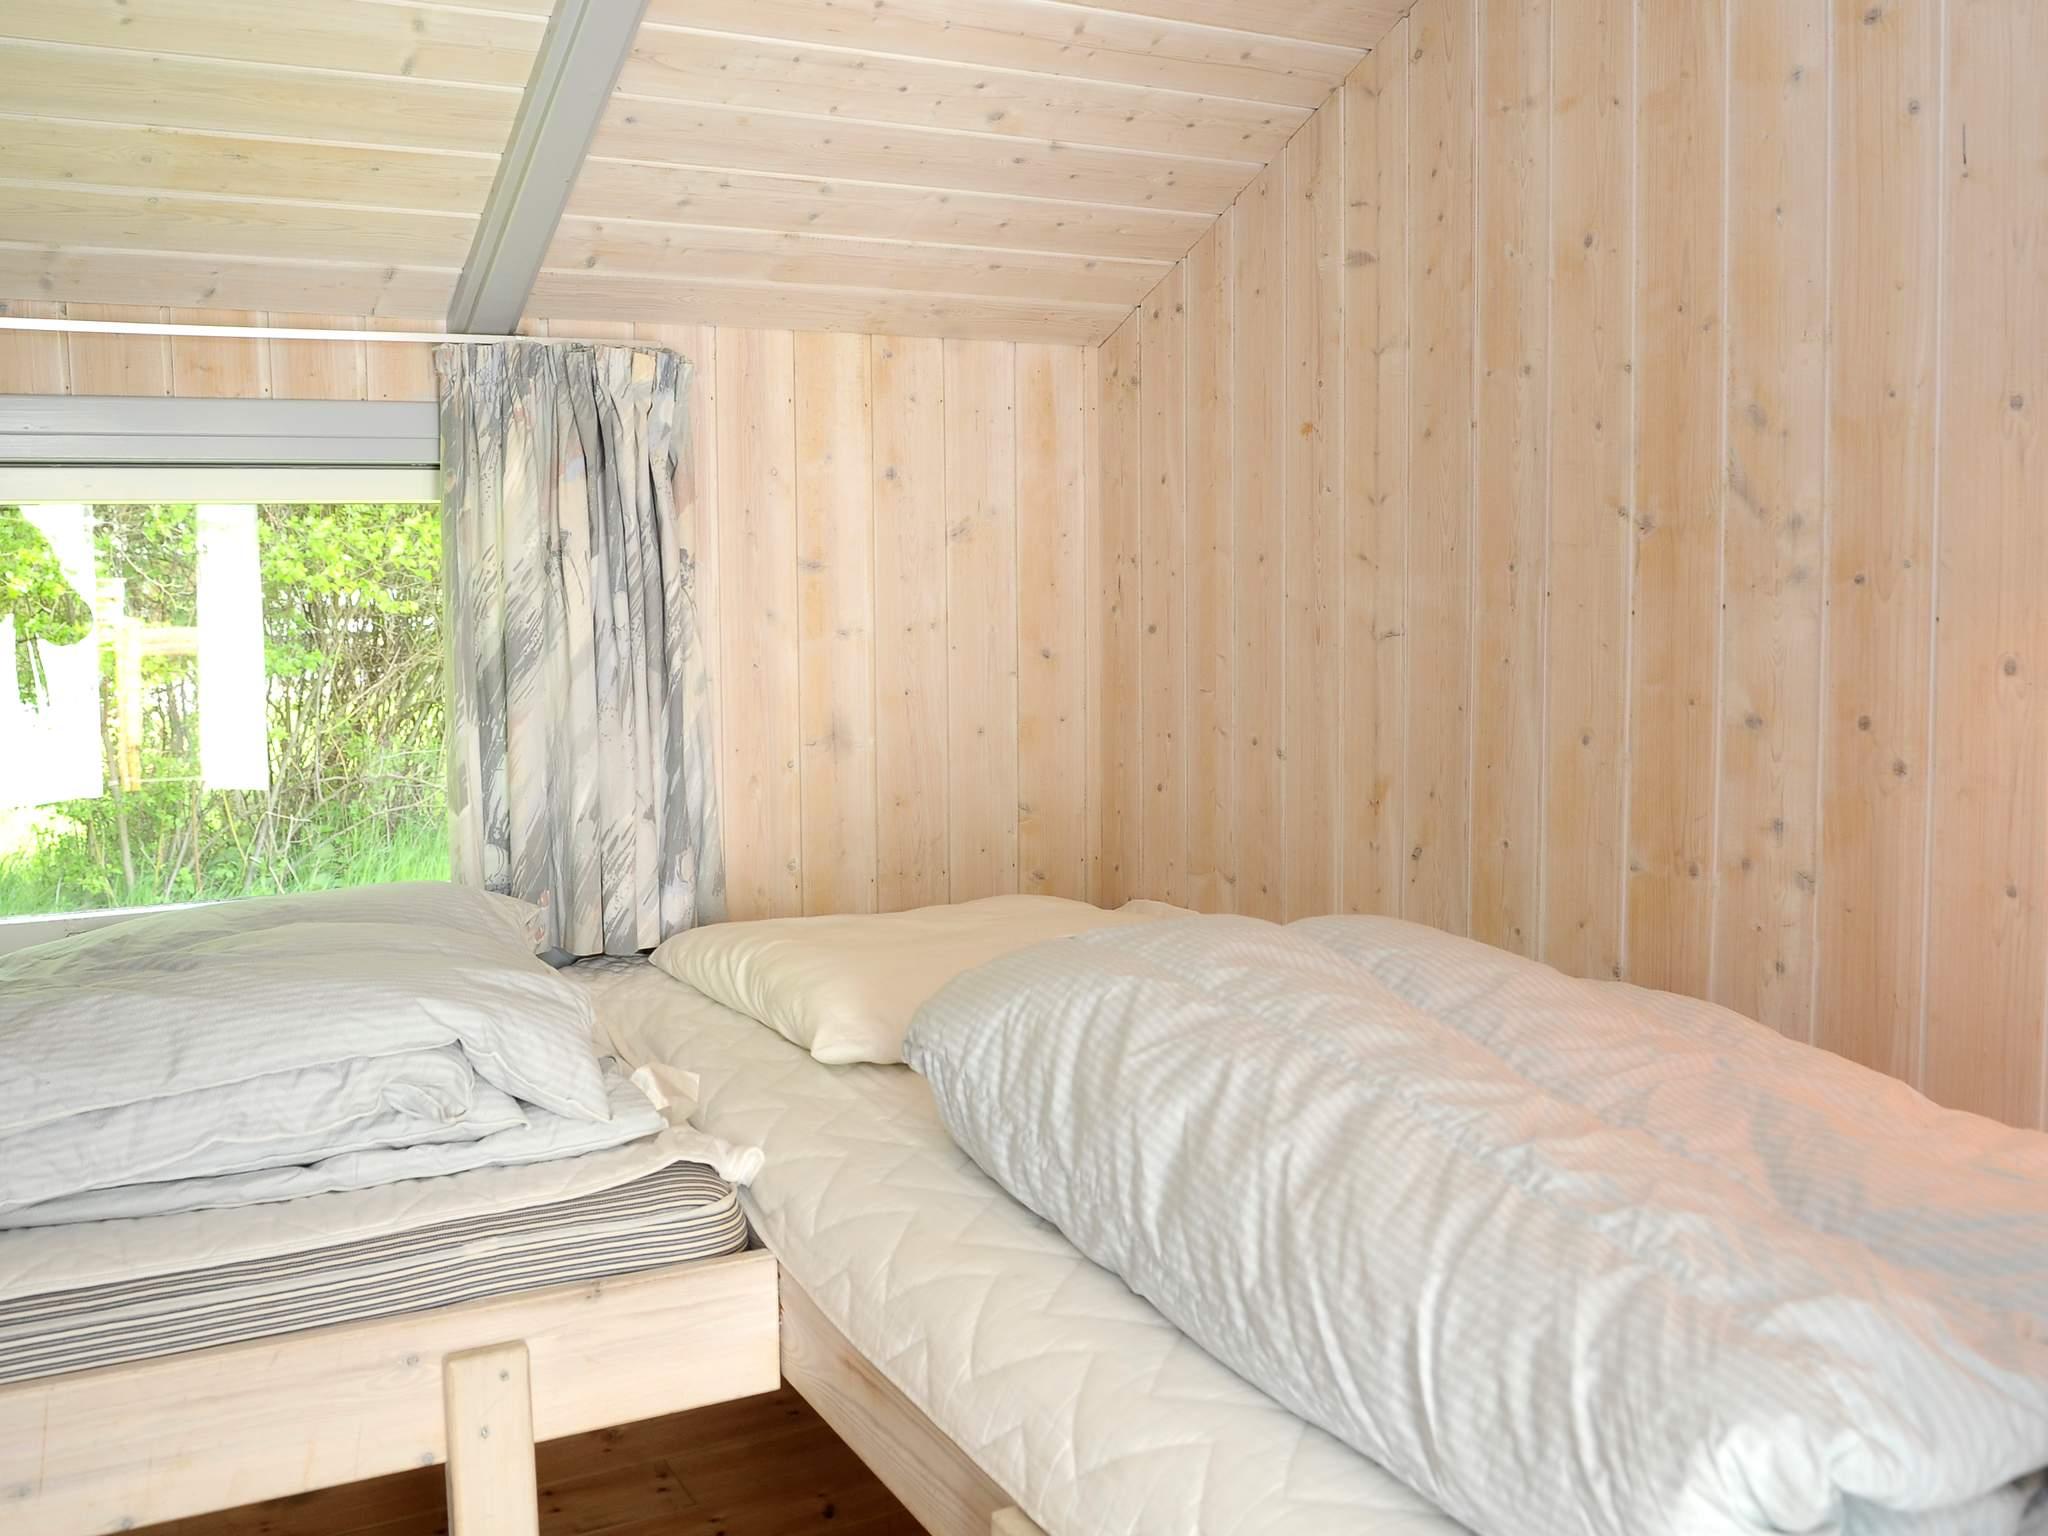 Ferienhaus Ristinge (93203), Ristinge, , Langeland, Dänemark, Bild 23